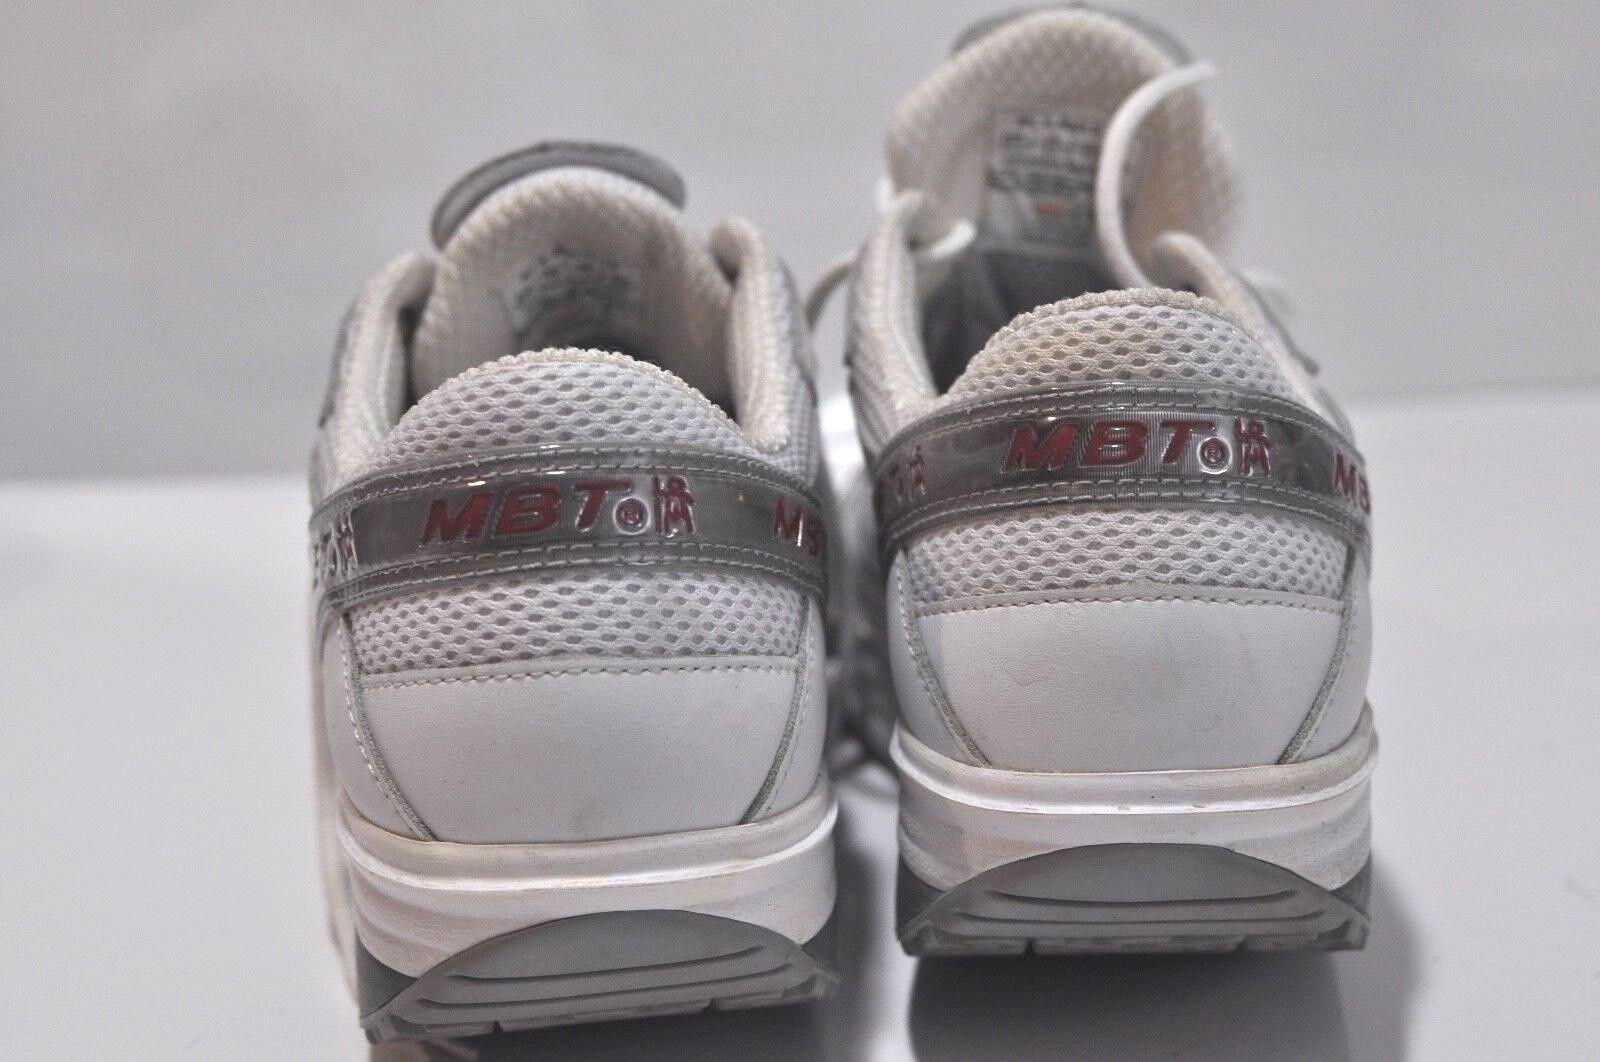 MBT Uomo Swiss Engineerosso scarpe Dimensione Dimensione Dimensione 8.5 a106cf